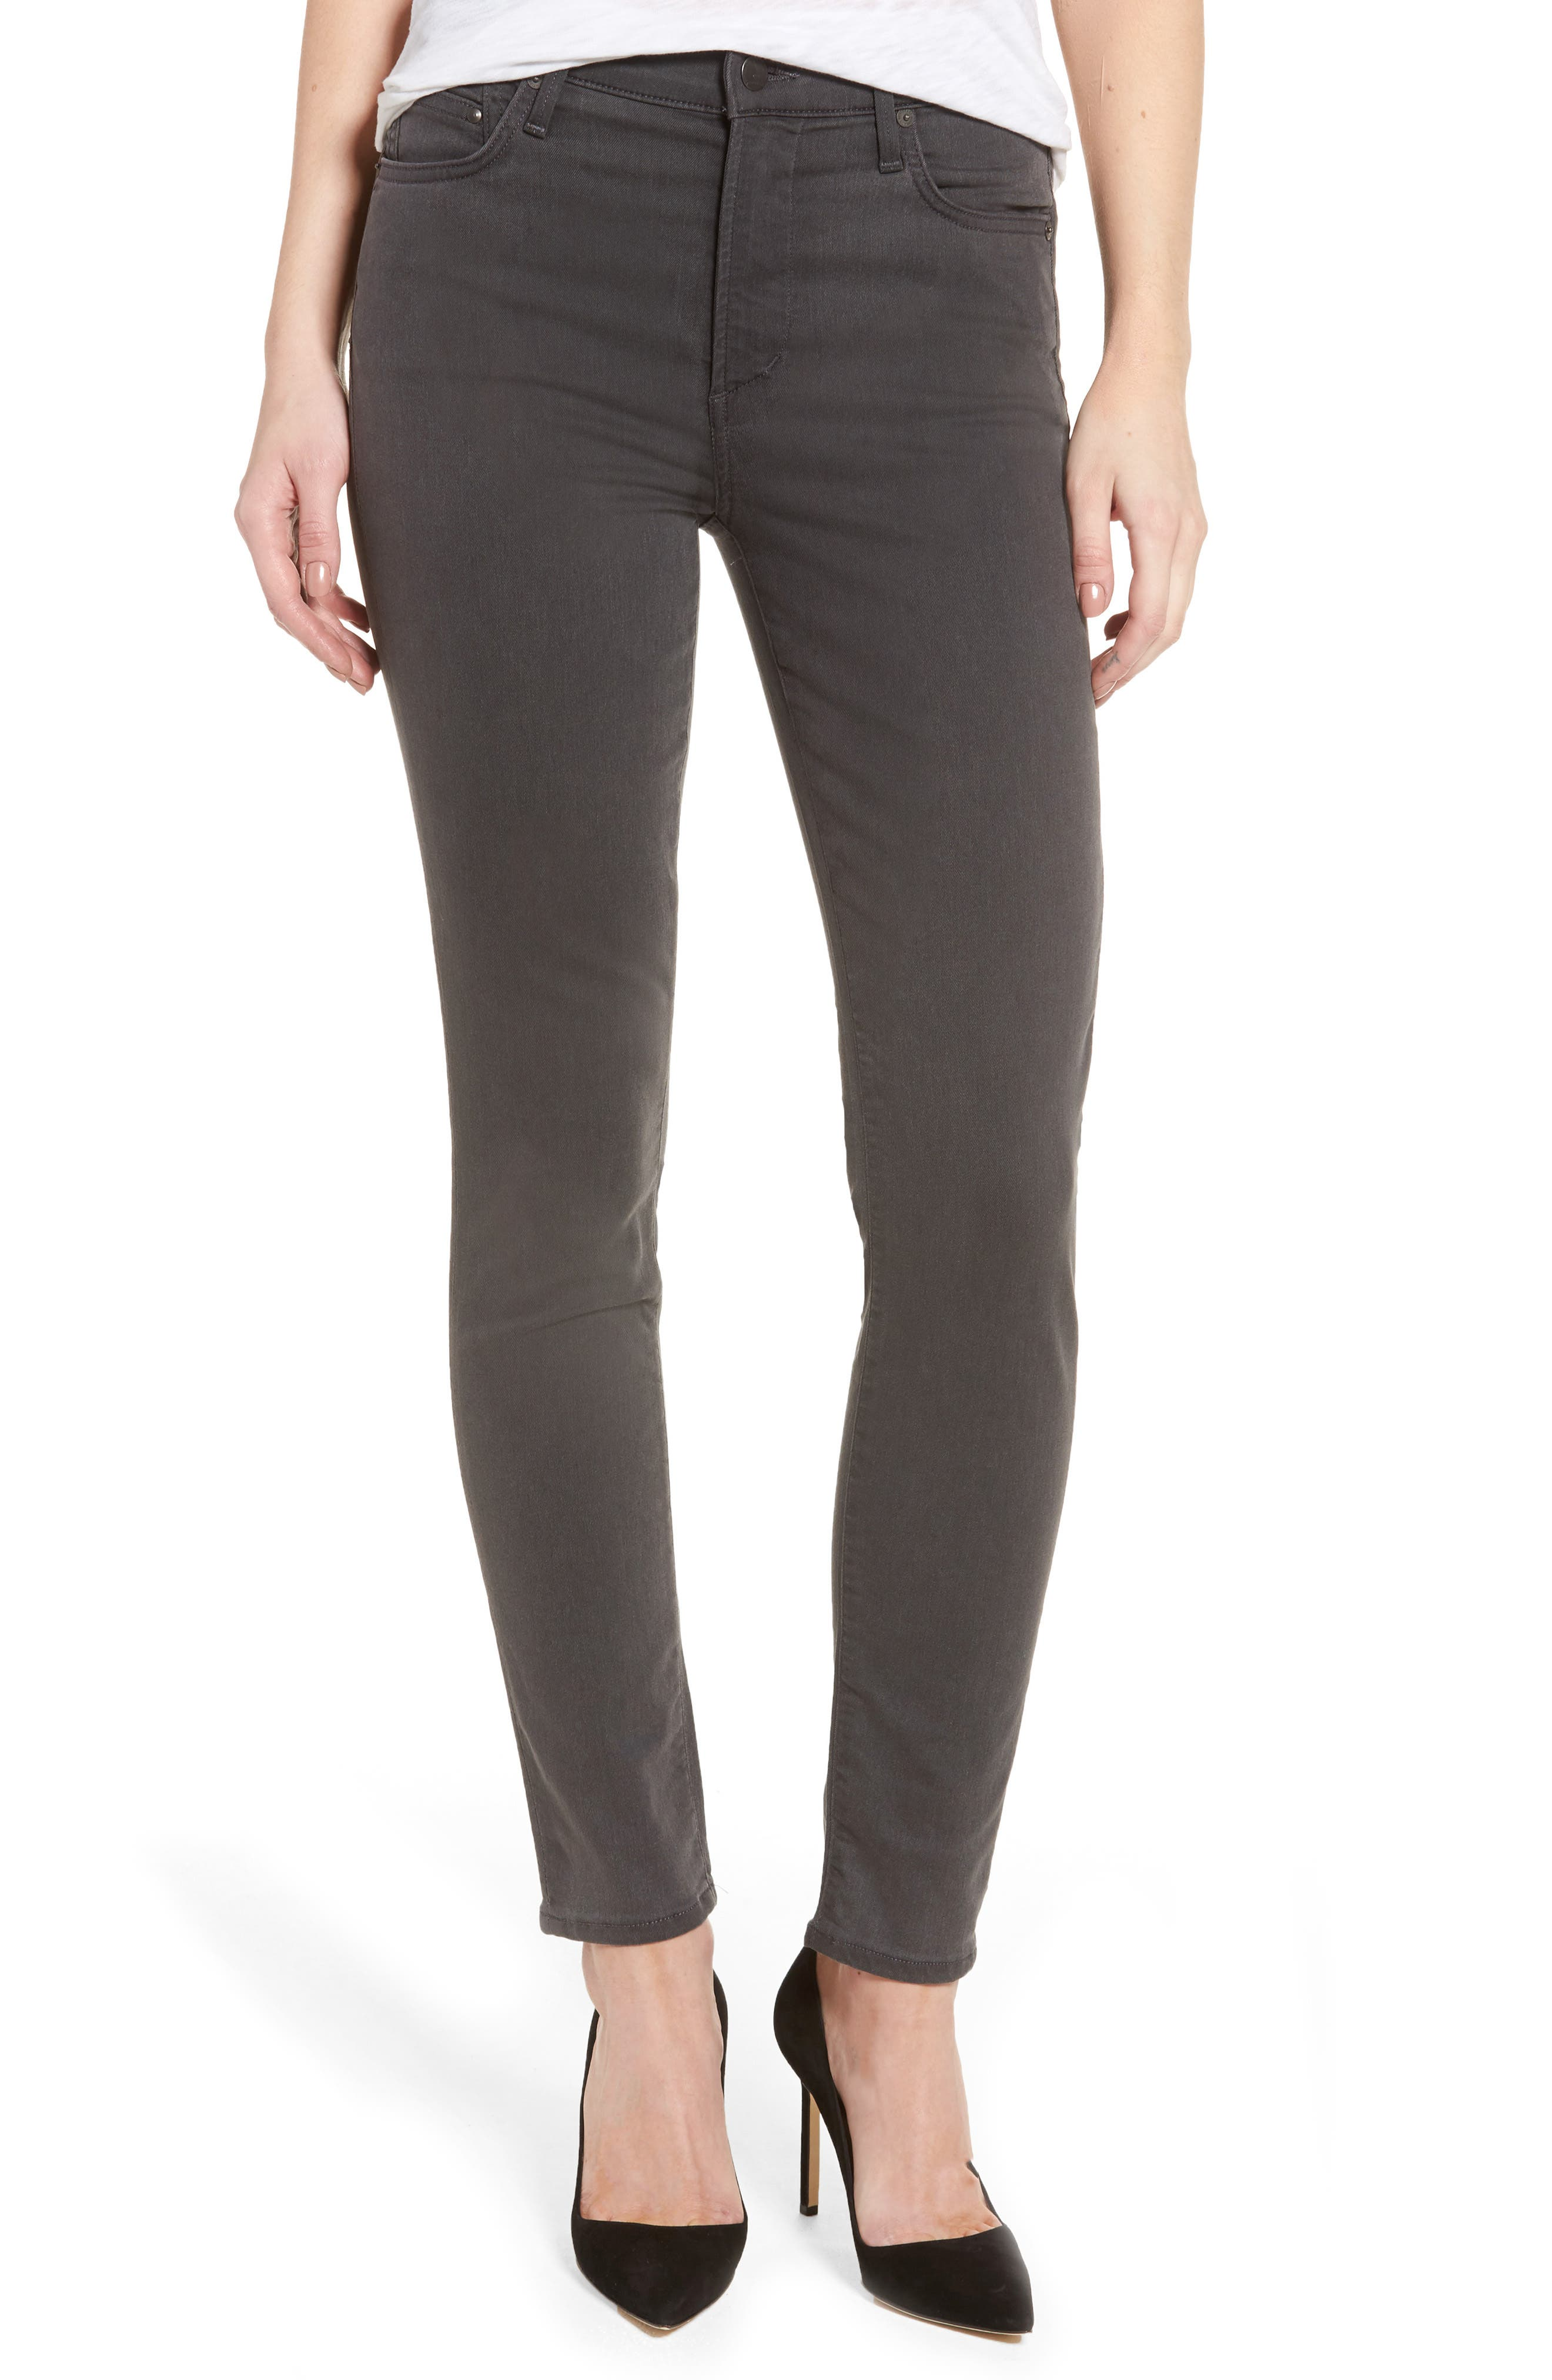 Rocket Petite High Waist Skinny Jeans,                         Main,                         color, 034